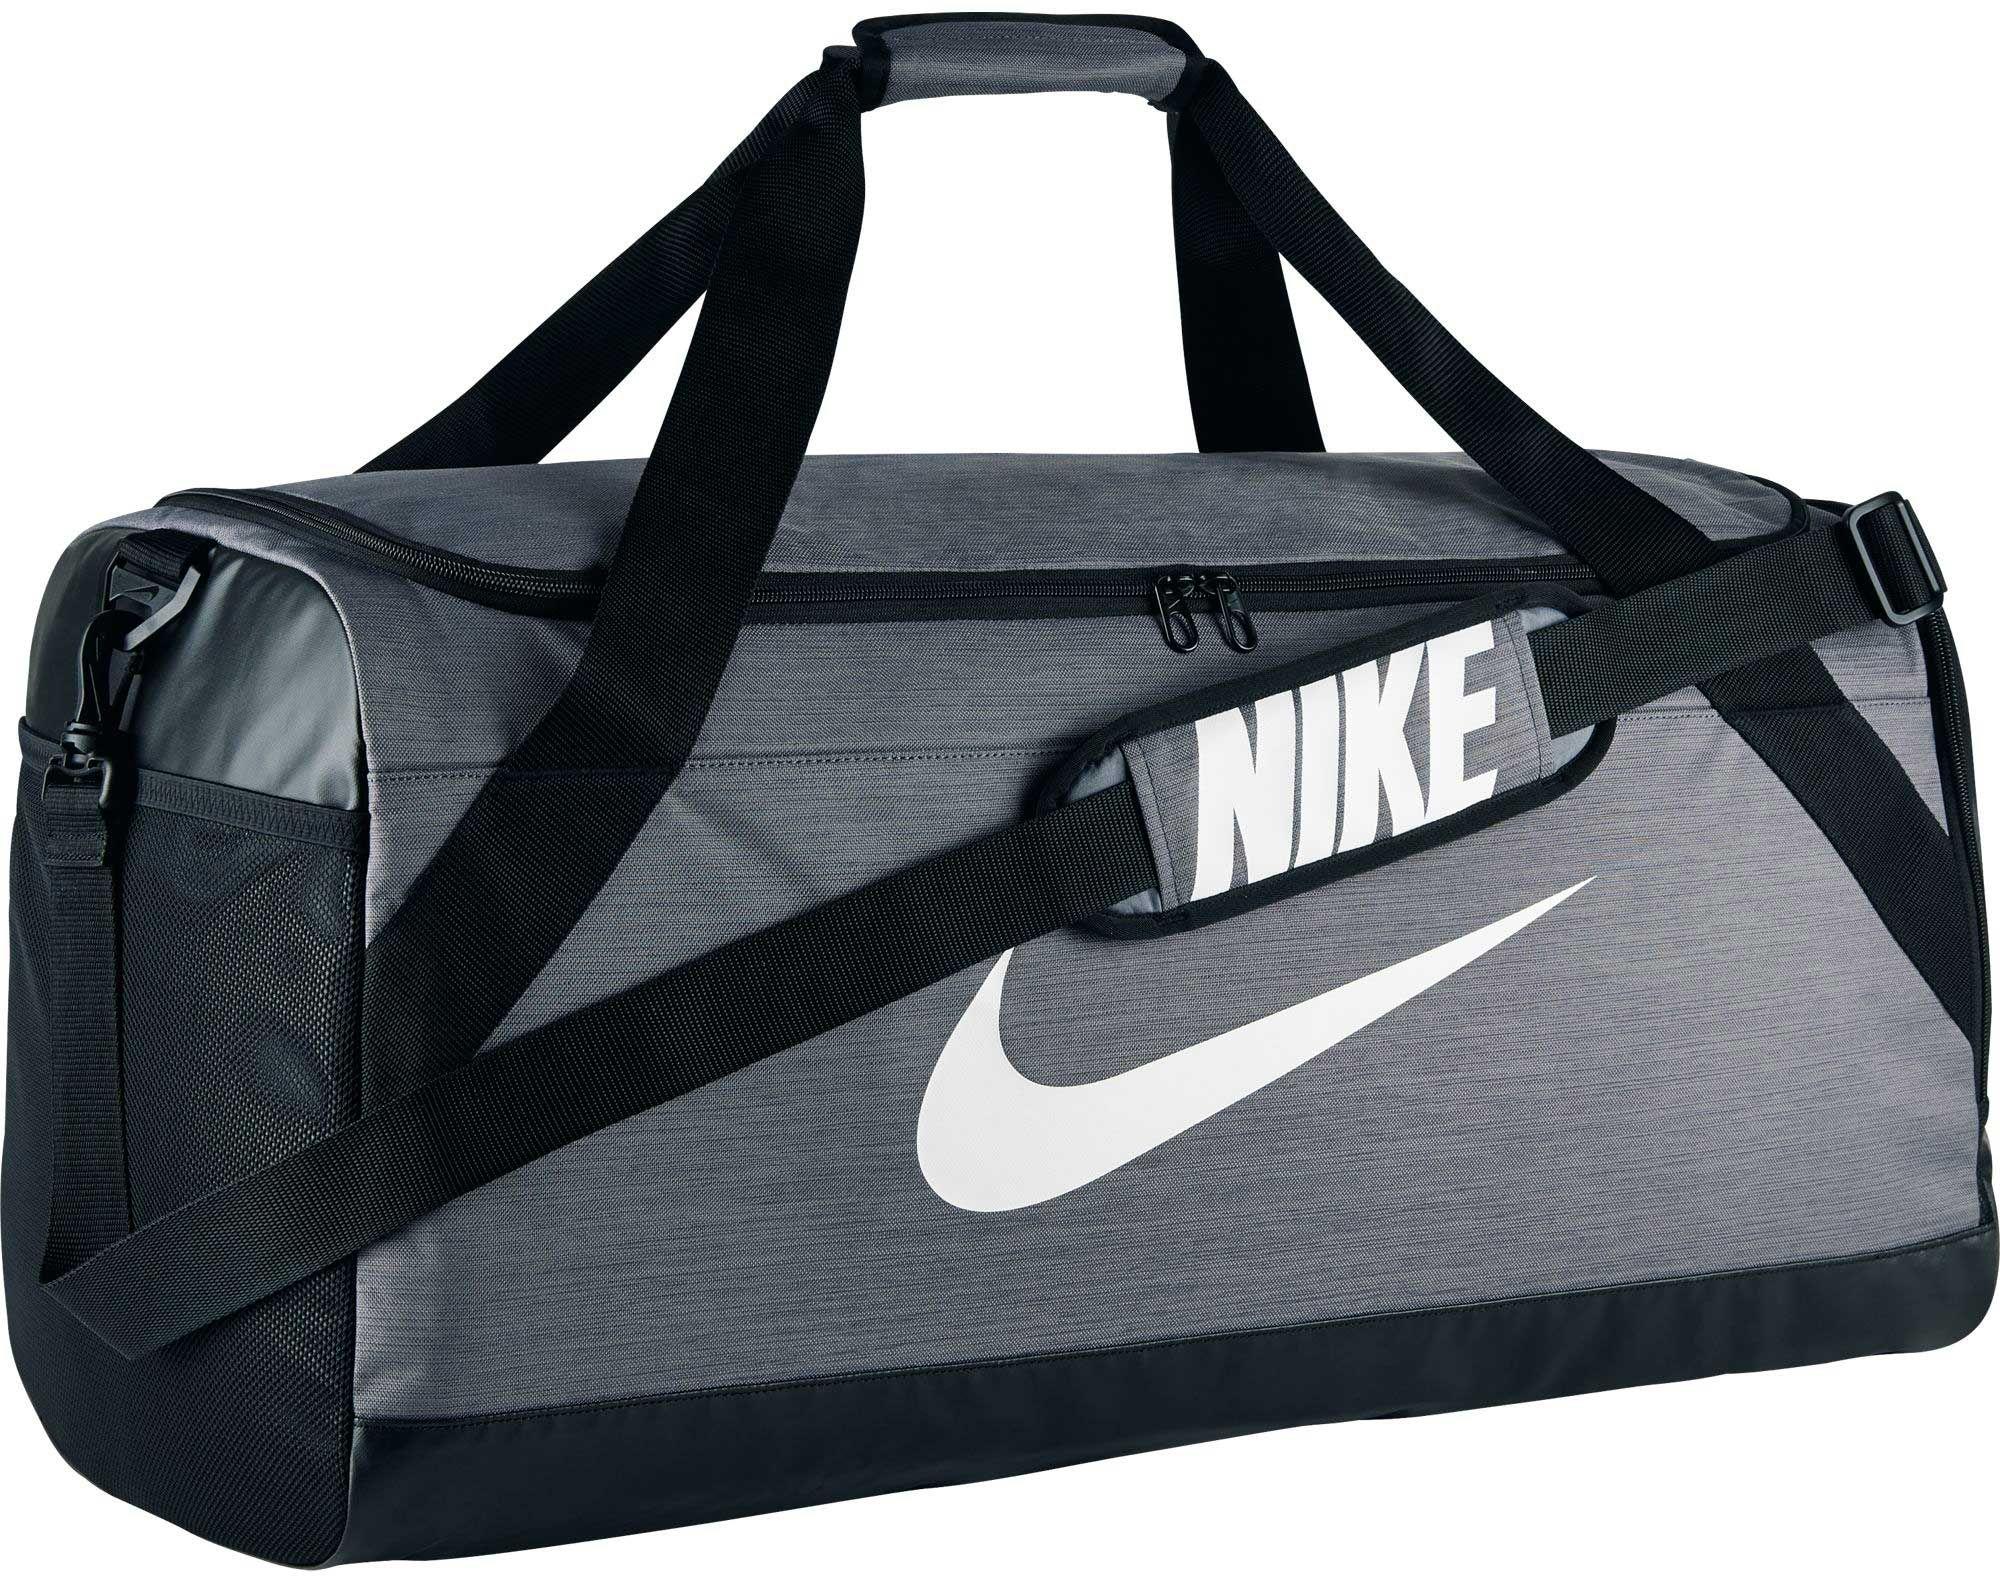 Nike Brasilia Large Duffle Bag $33, More + Free ship on $25+